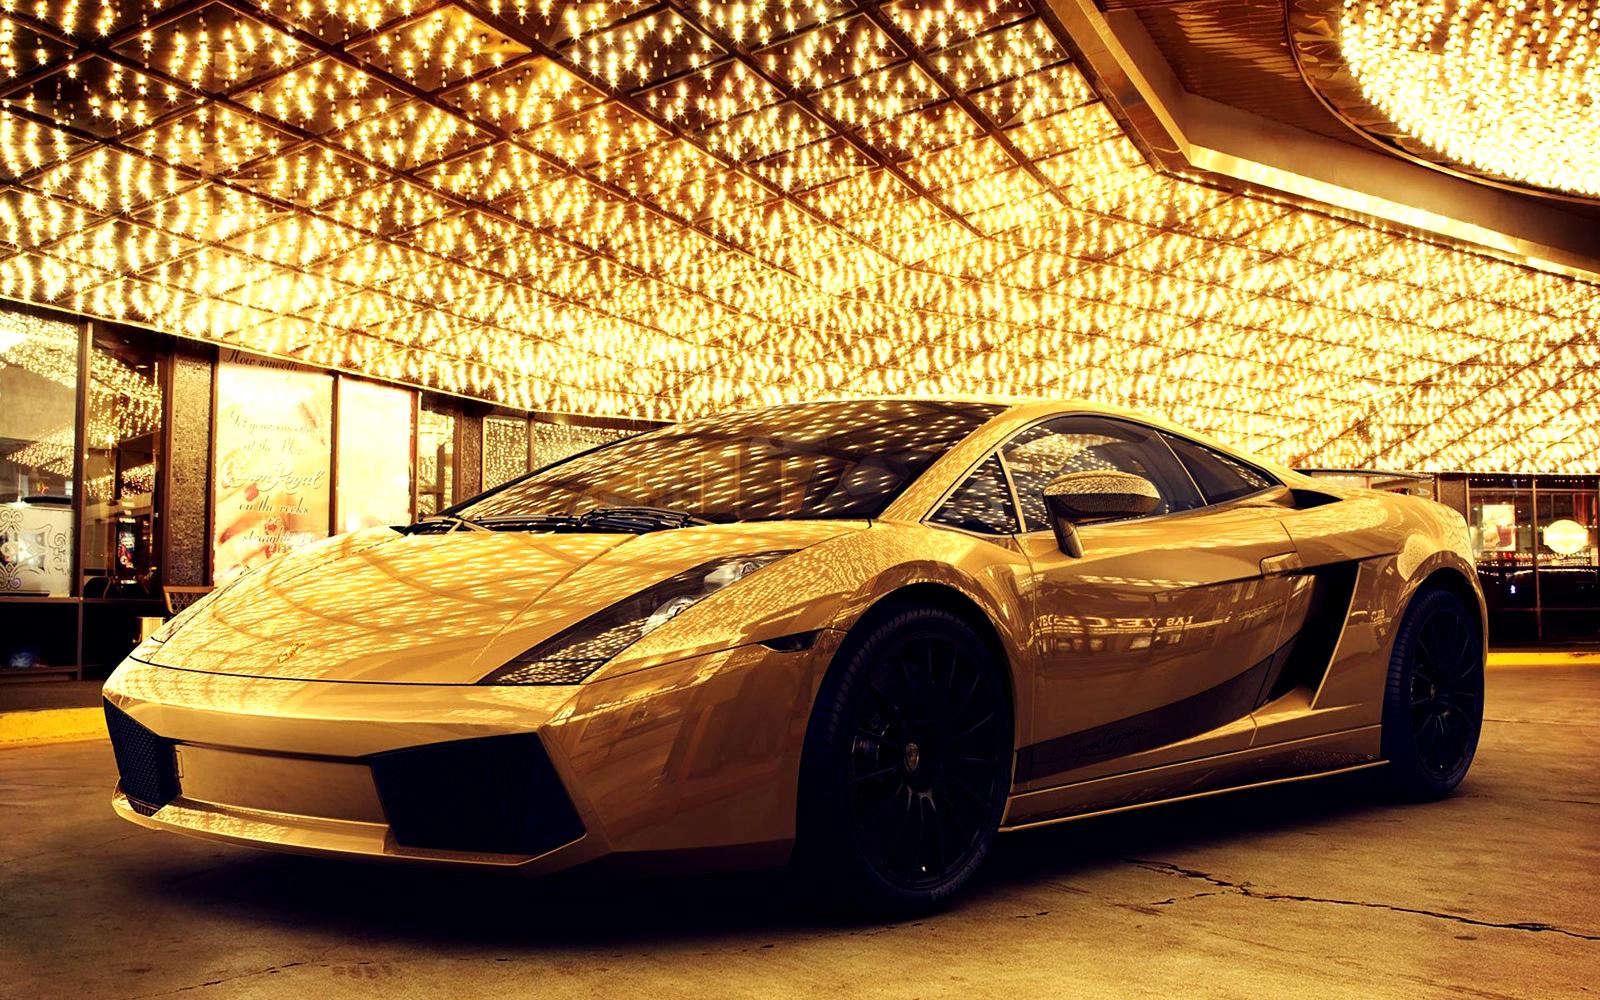 Golden Lamborghini Gallardo HD Wallpaper